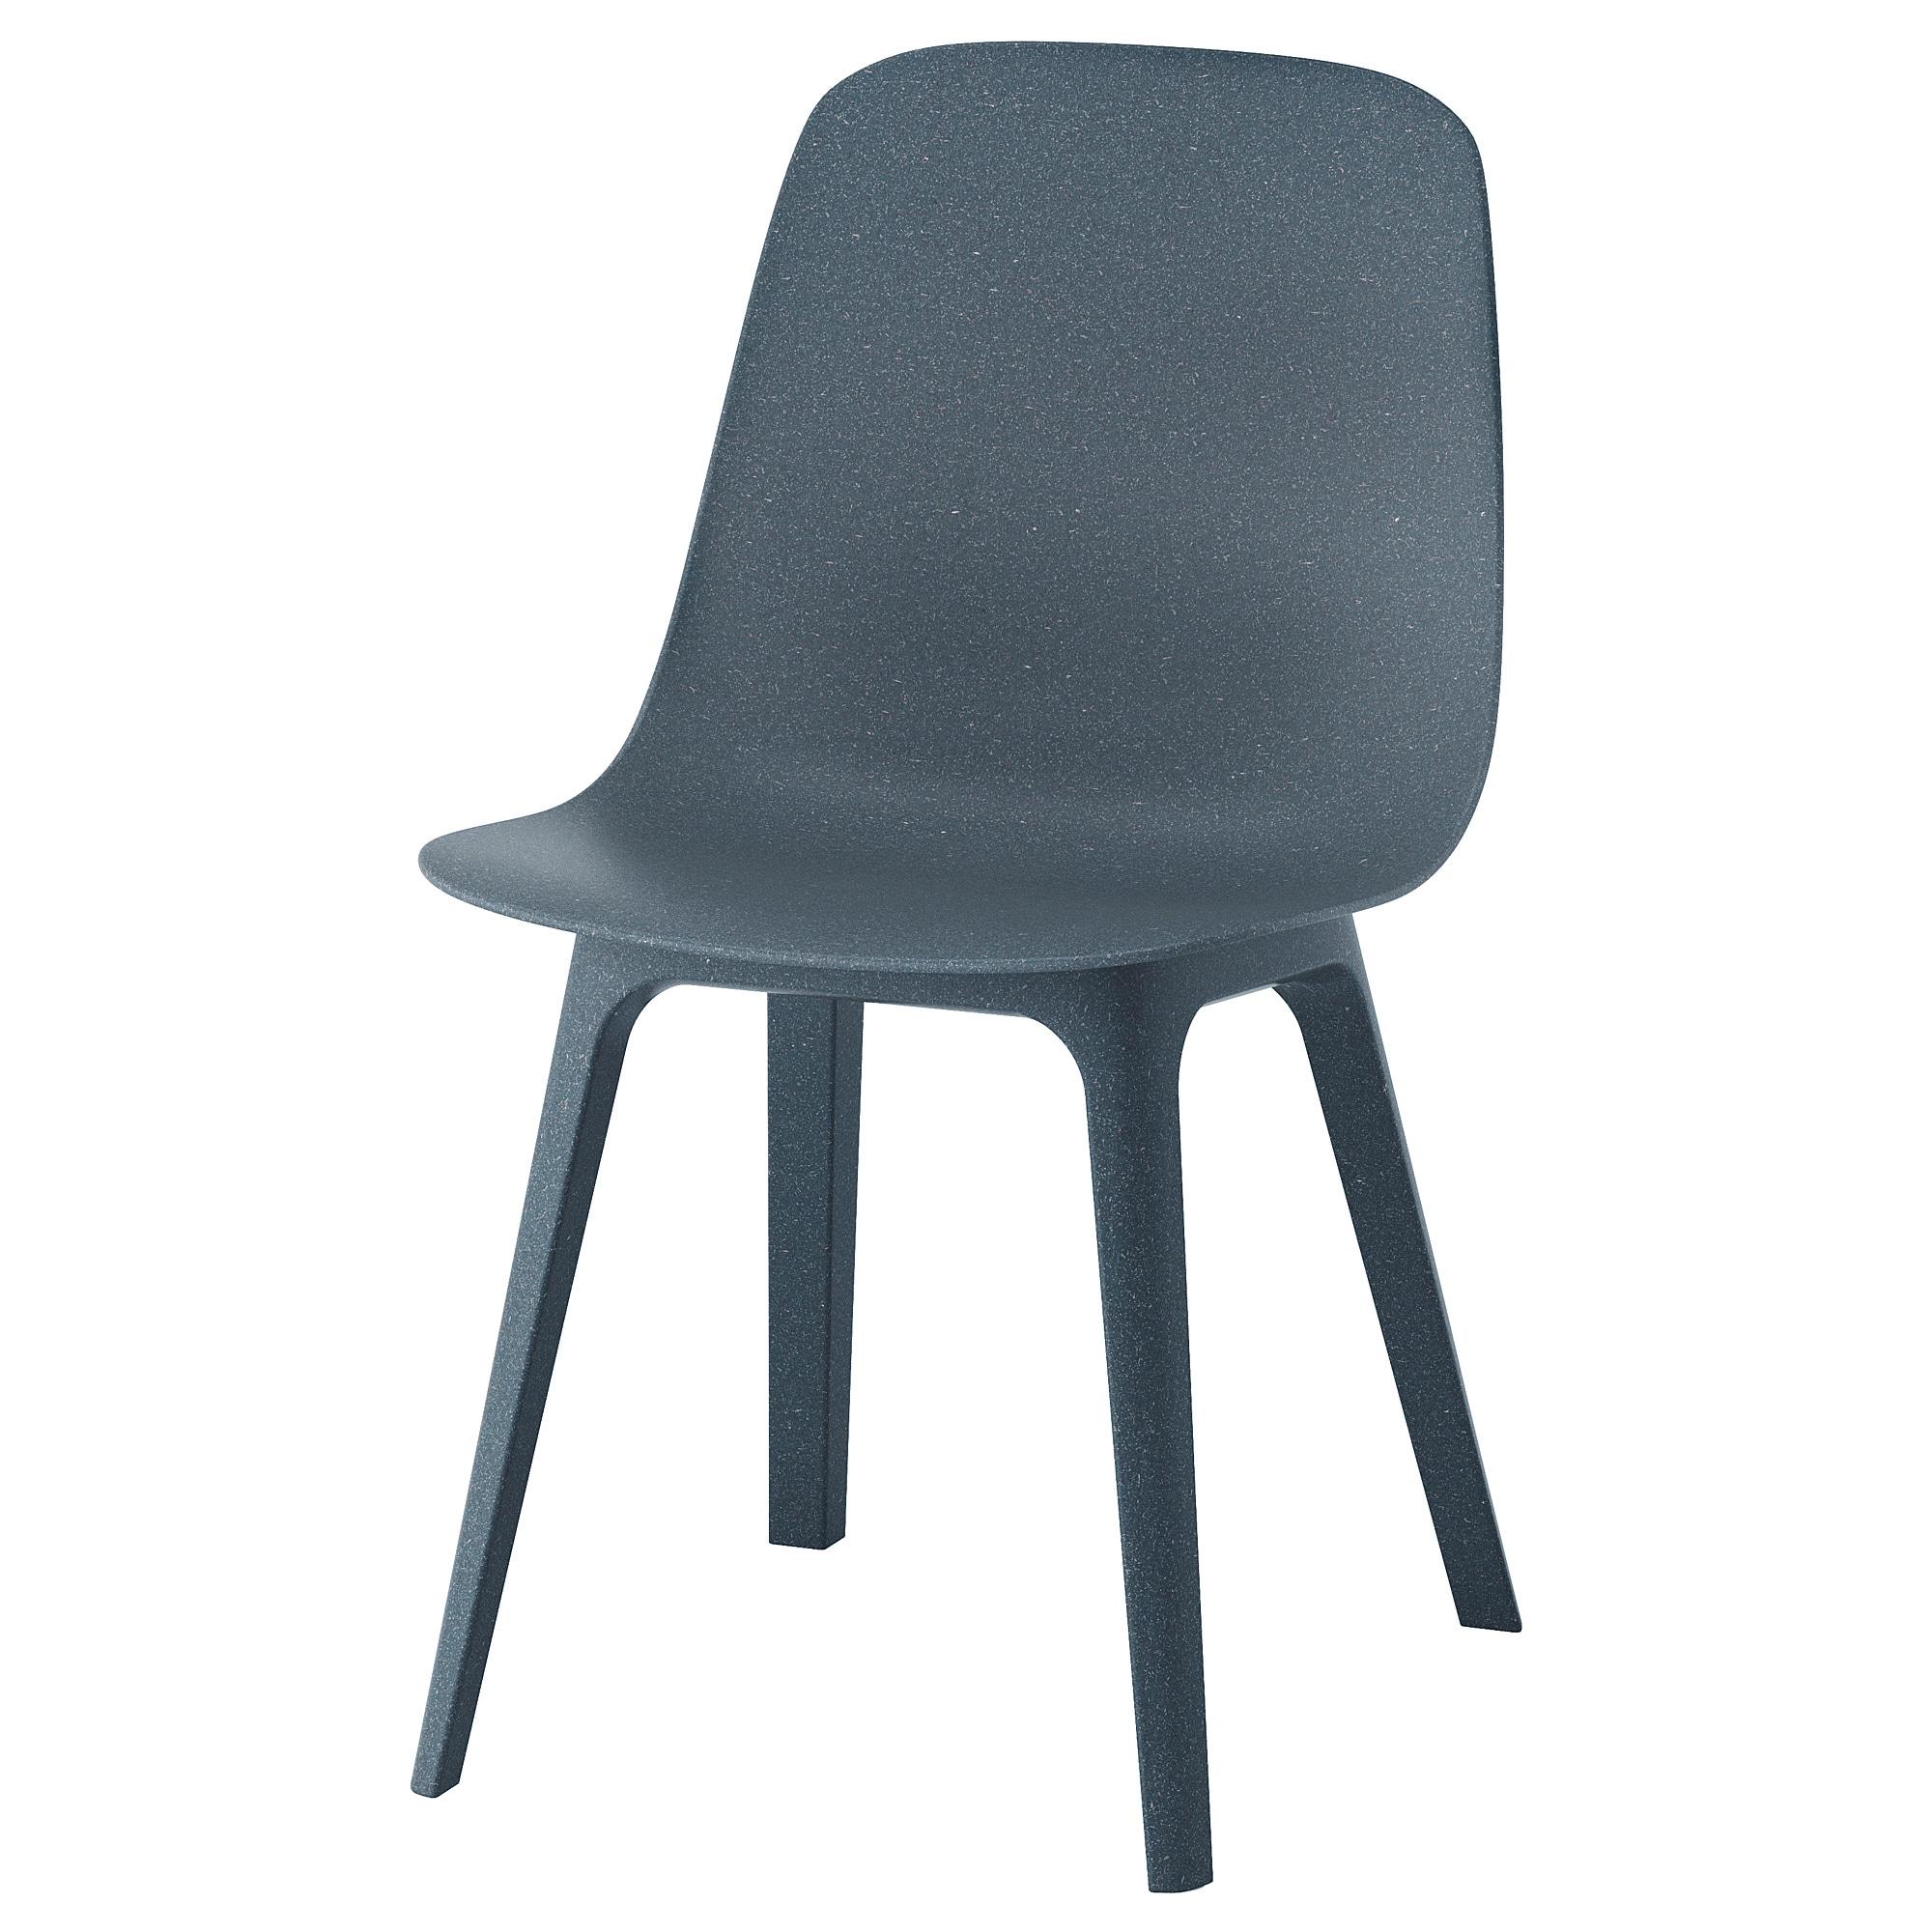 Odger Chaise Bleu Chaise Diy Ikea Odger Et Chaise Ikea